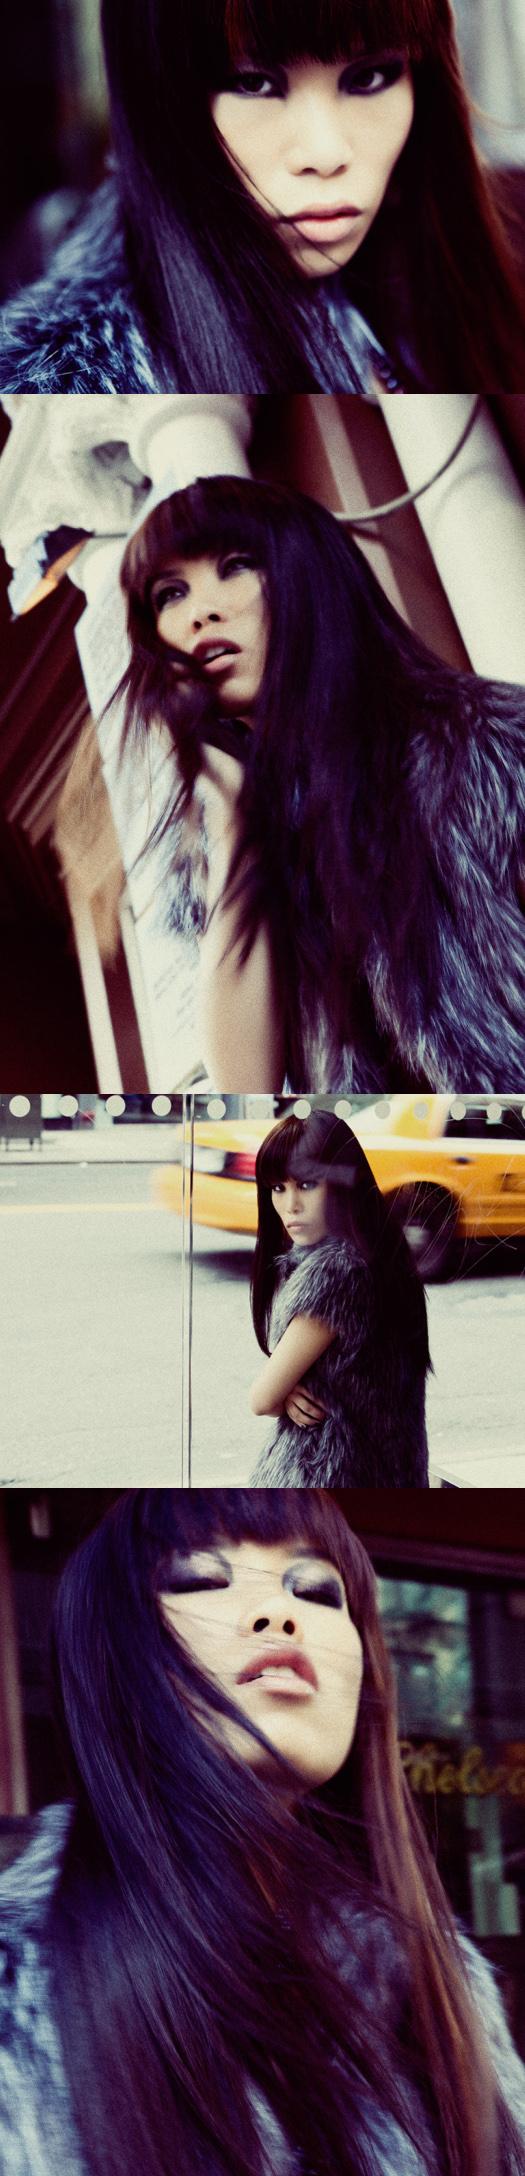 NY Oct 03, 2009 Photographer: Yulia G, MUA & Hair: Tina G, Model: Nikita K Forbidden Affection